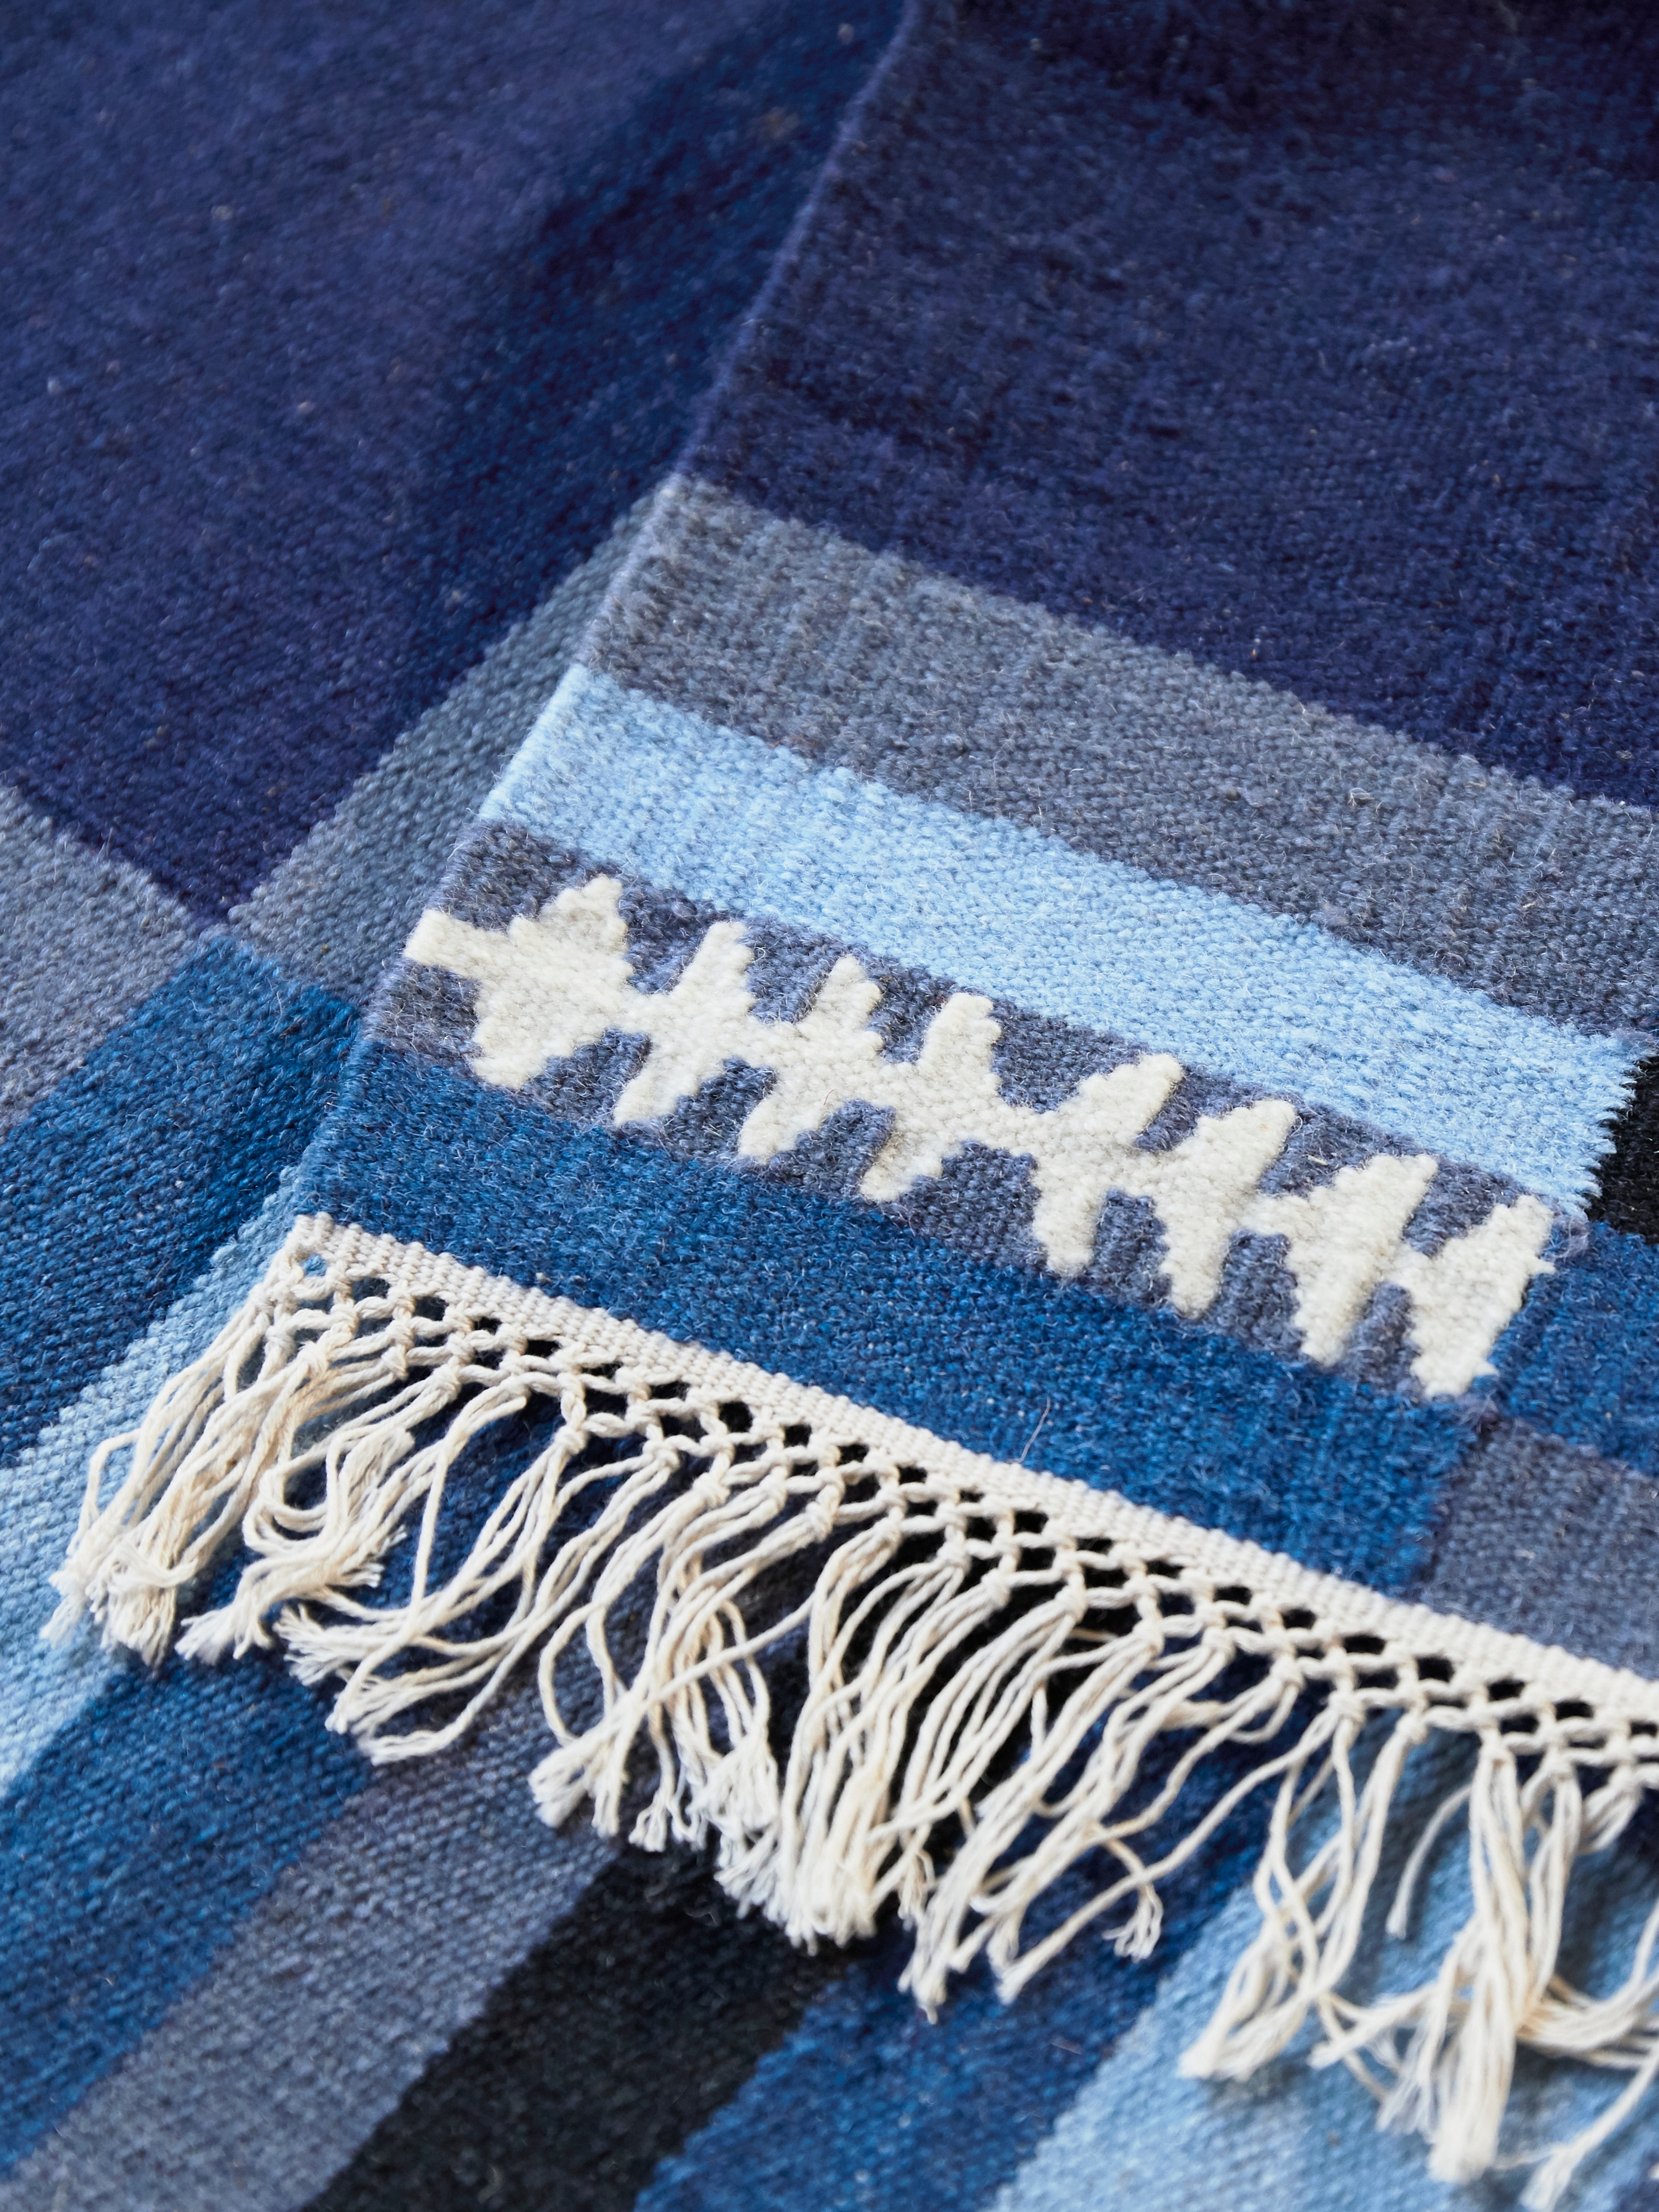 Dettaglio di un tappeto a tessitura piatta TRANGET in lana, con frange bianche e motivo a rettangoli in varie tonalità di blu.